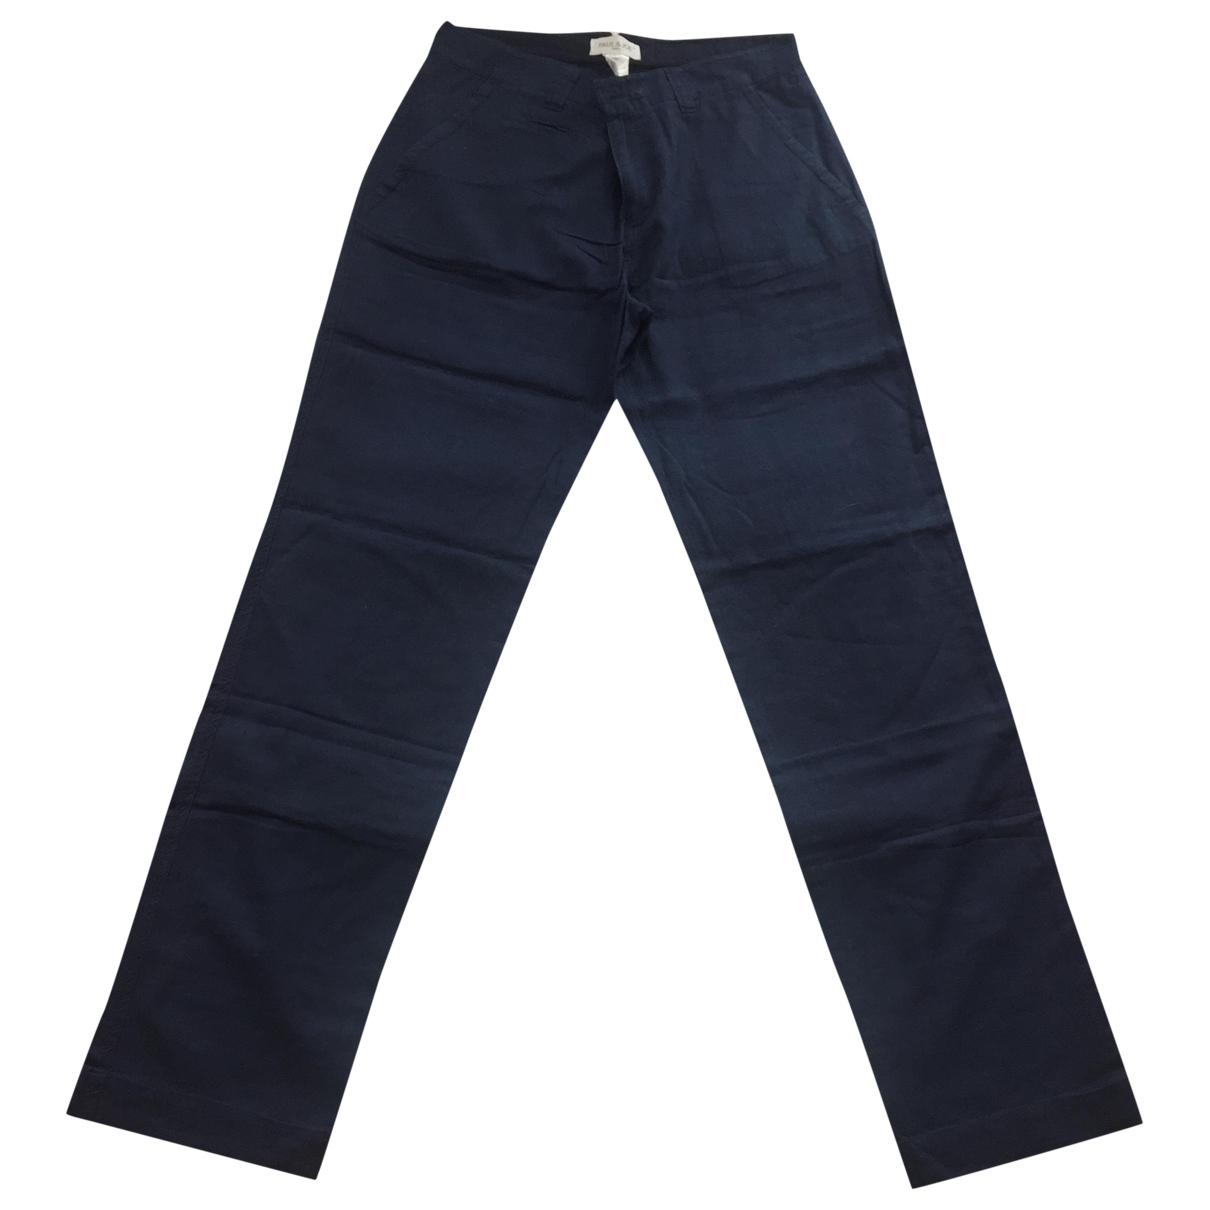 Pantalon de Lino Paul & Joe